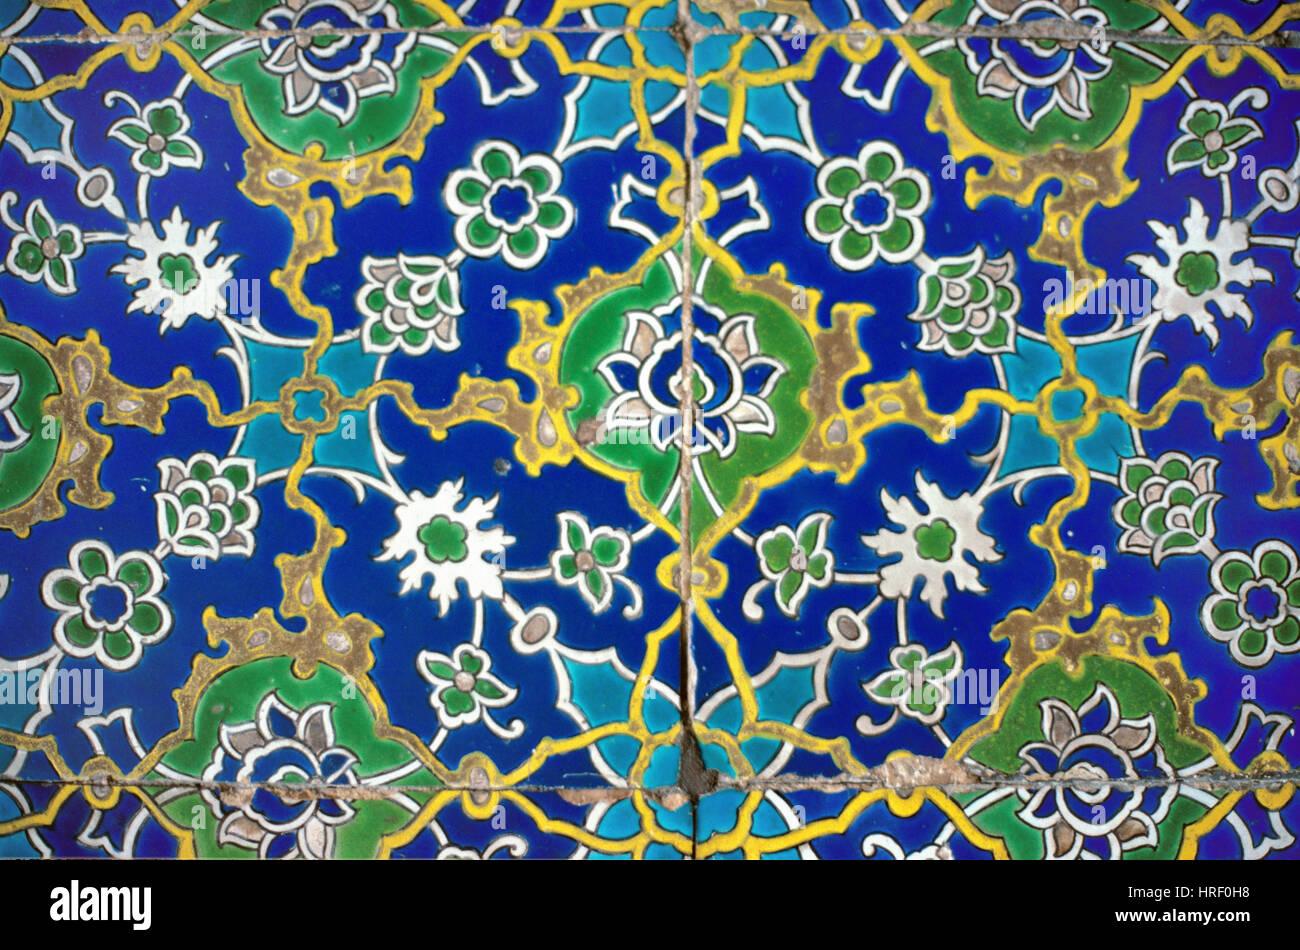 Iznik Wall Tiles at Entrance to the Throne Room Topkapi Palace Istanbul Turkey - Stock Image